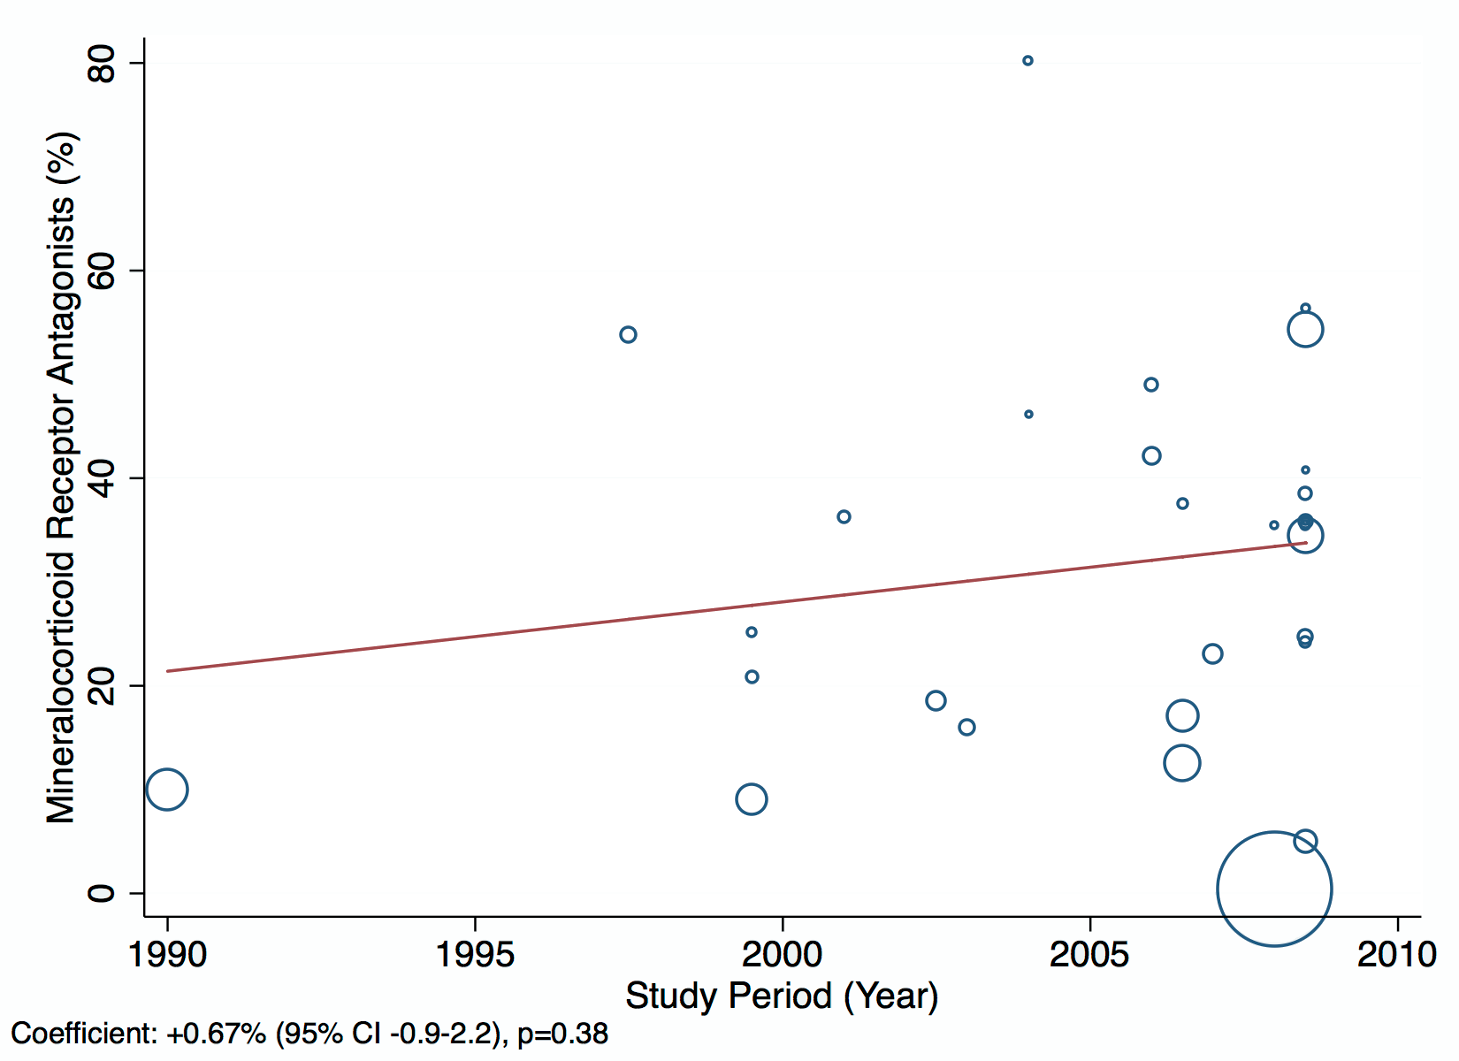 Meta-regression of mineralocorticoid receptor antagonist use against study period.